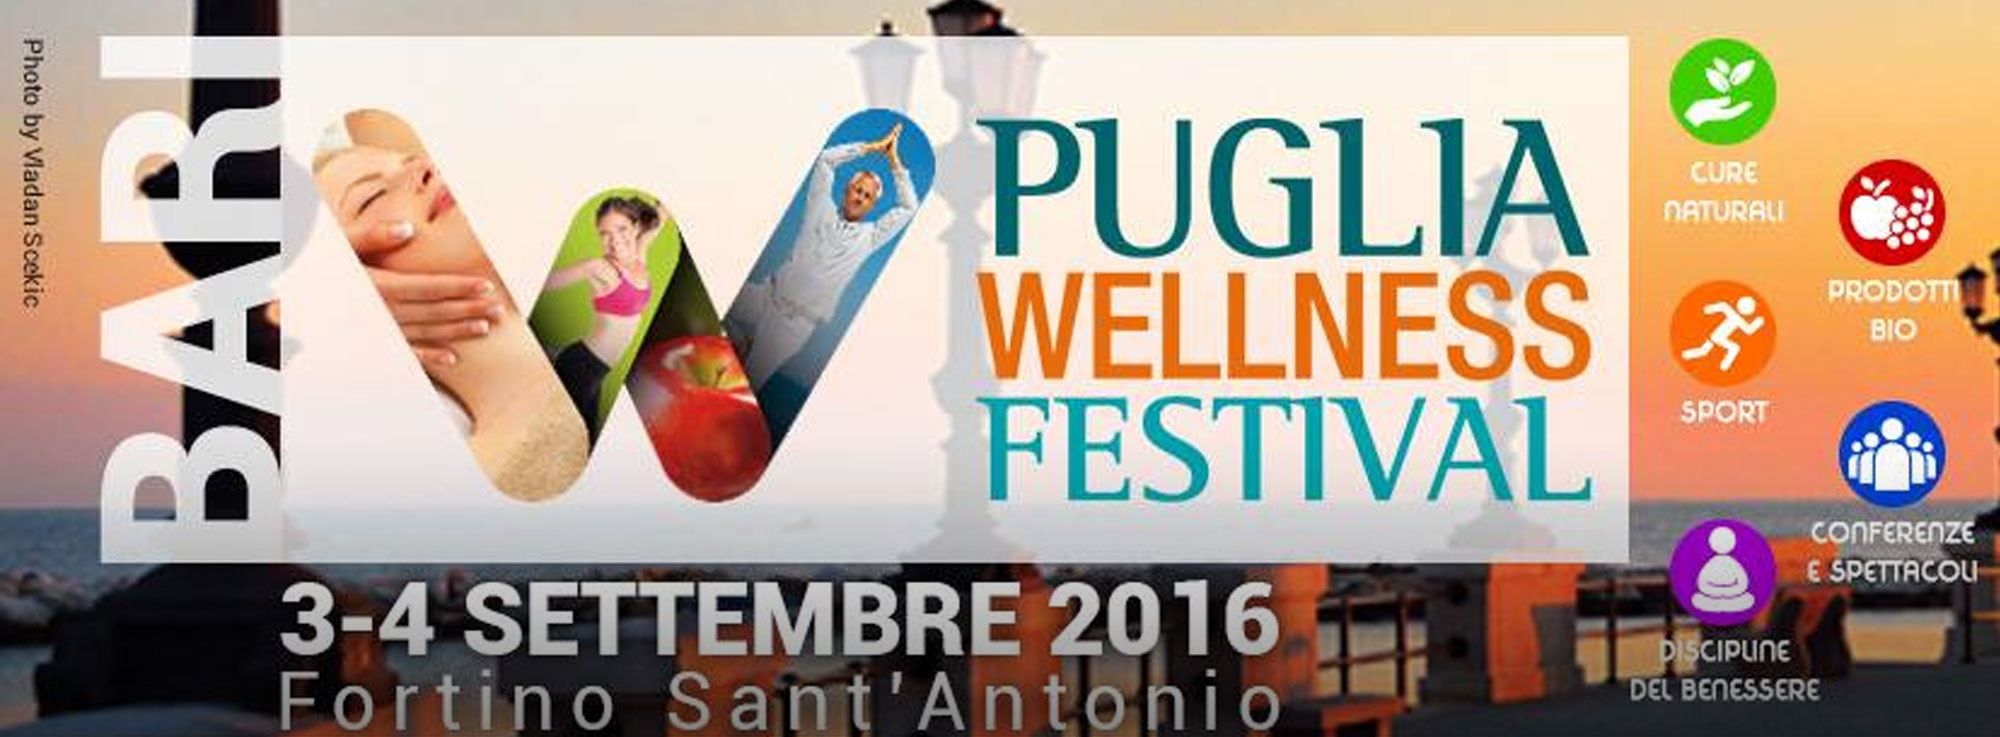 Bari: Puglia Wellness Festival